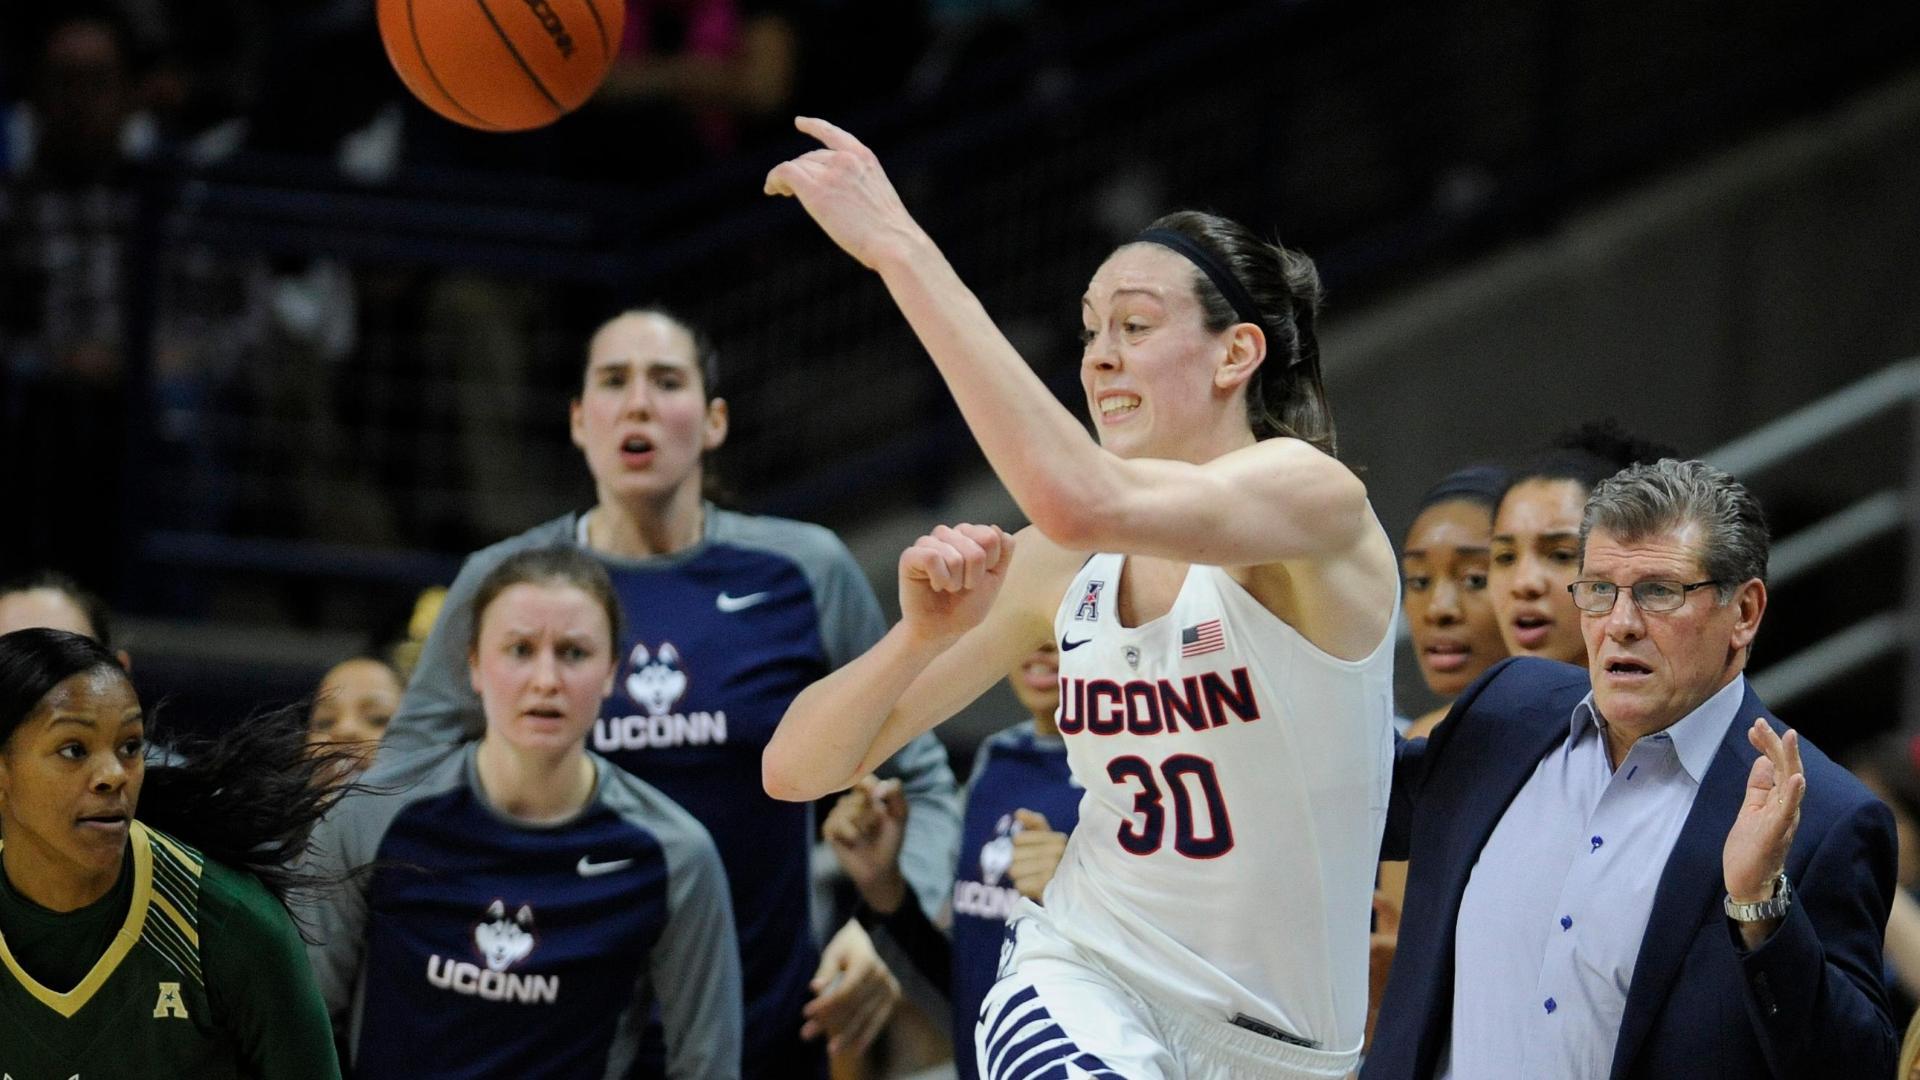 Lawson: UConn on a remarkable run